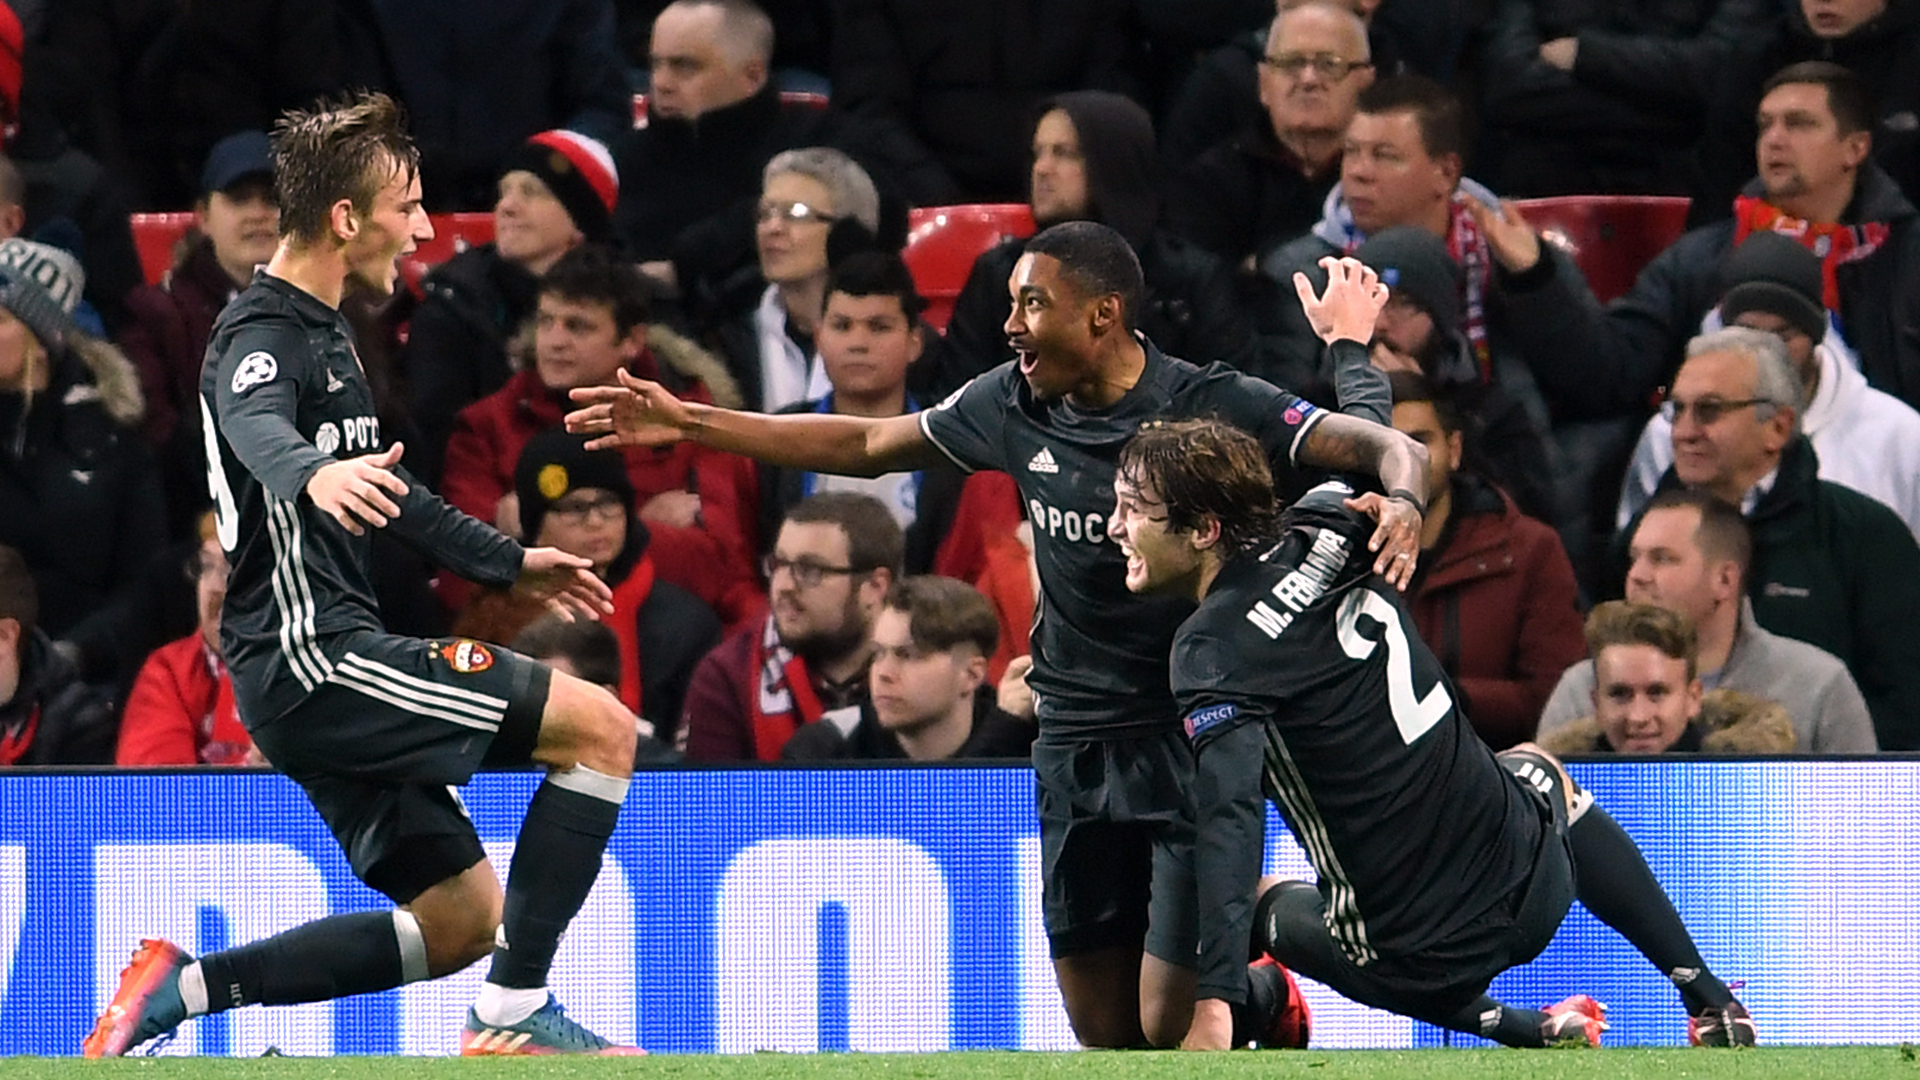 CSKA celebrate Manchester United